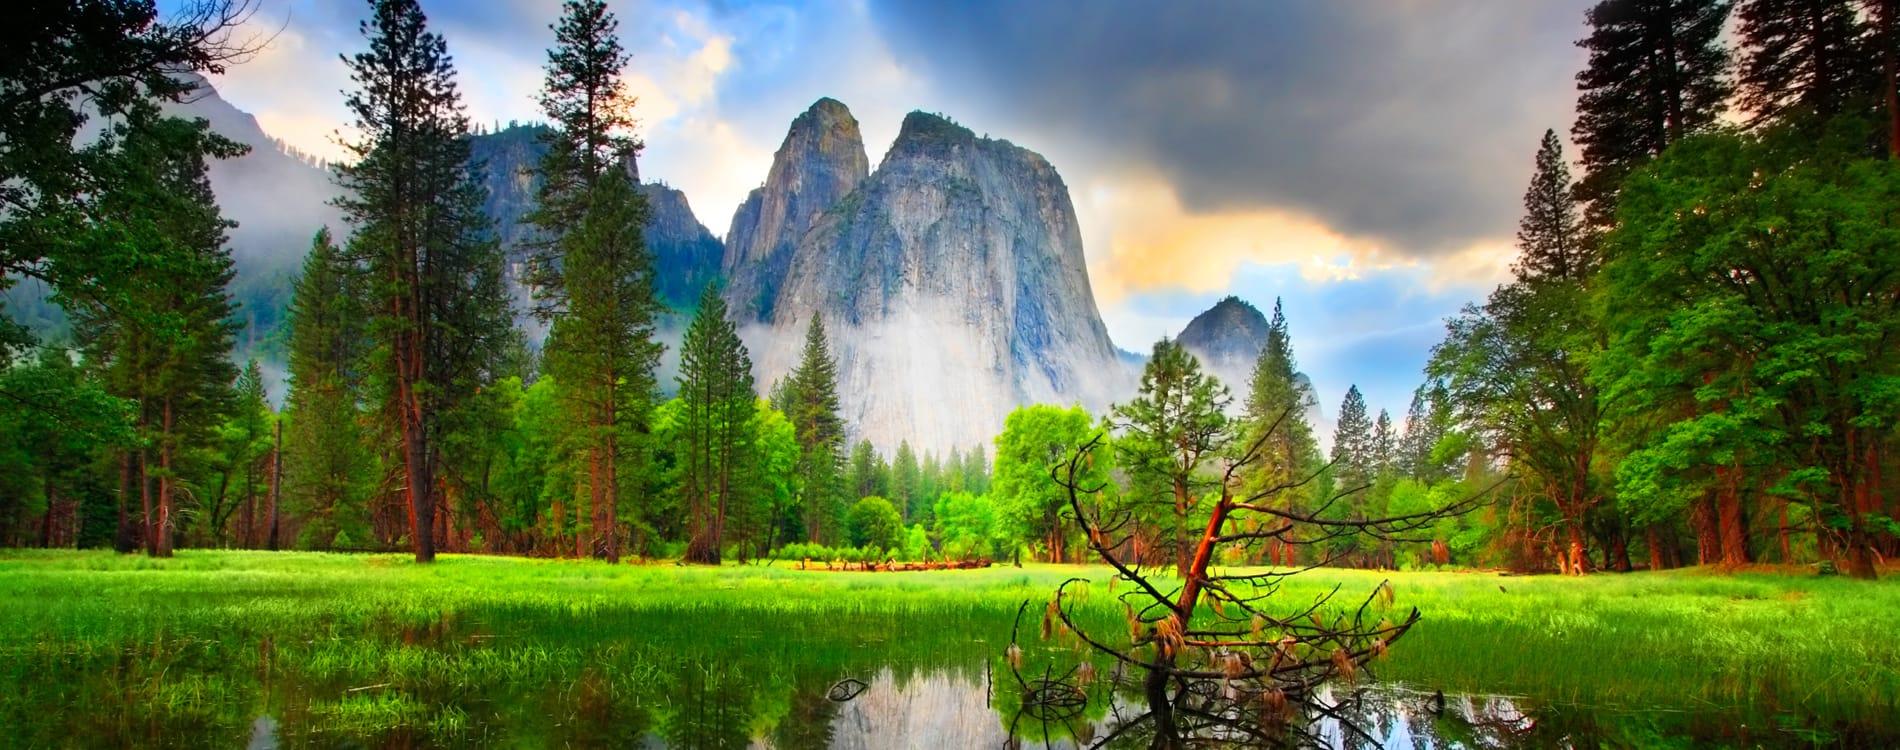 Yosemite National Park - Cathedral Rocks